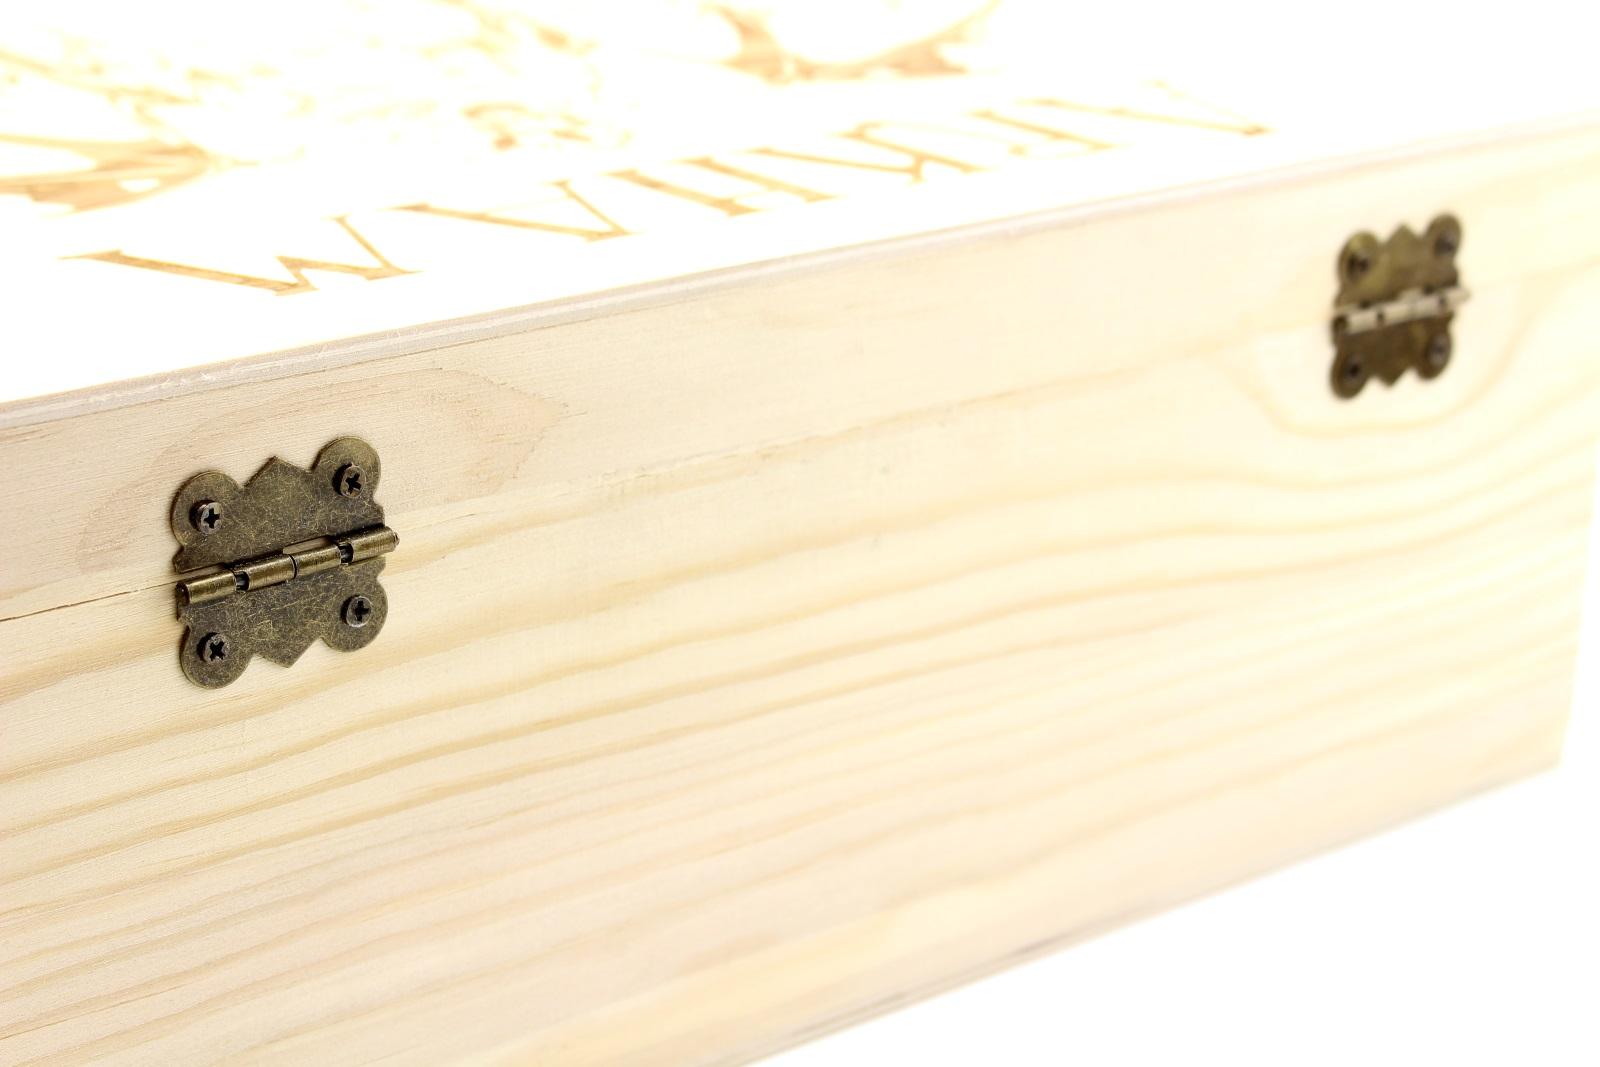 High Quality Printed Cards Arkham Horror LCG Deck Box Dividers